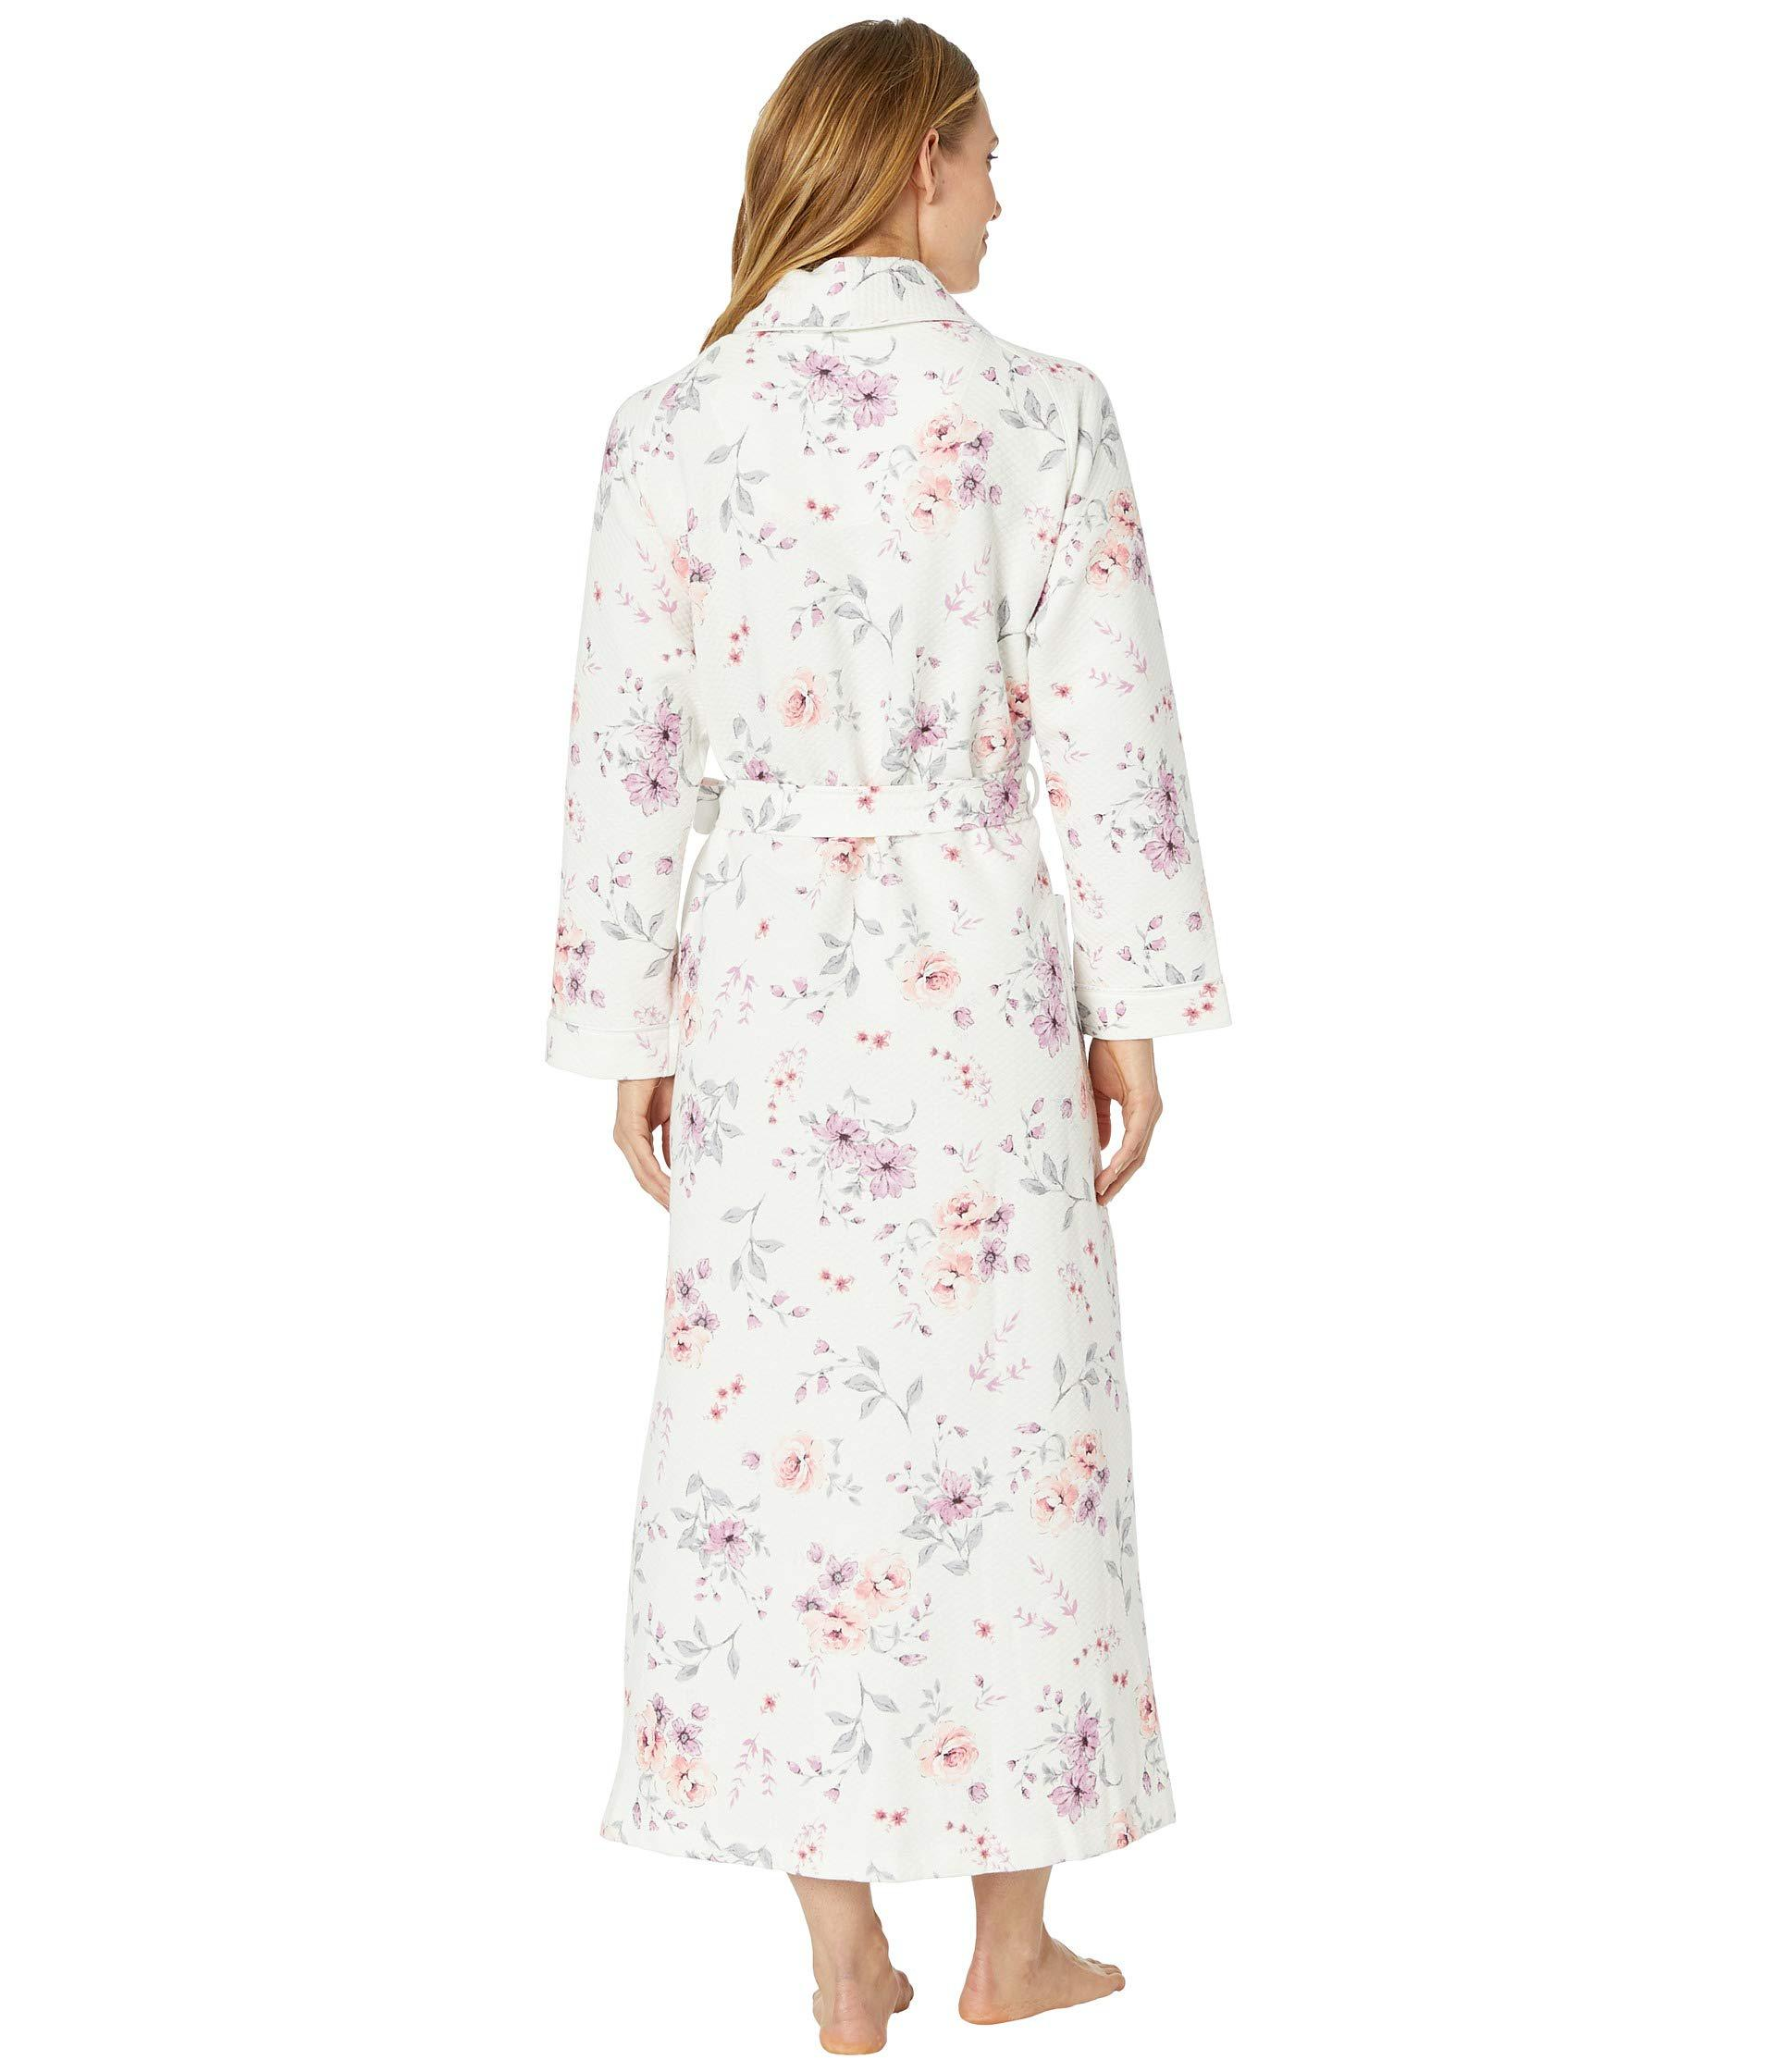 ... Diamond Quilt Wrap Robe (multi Rose Floral) Women s Robe -. View  fullscreen 1dca5afa4